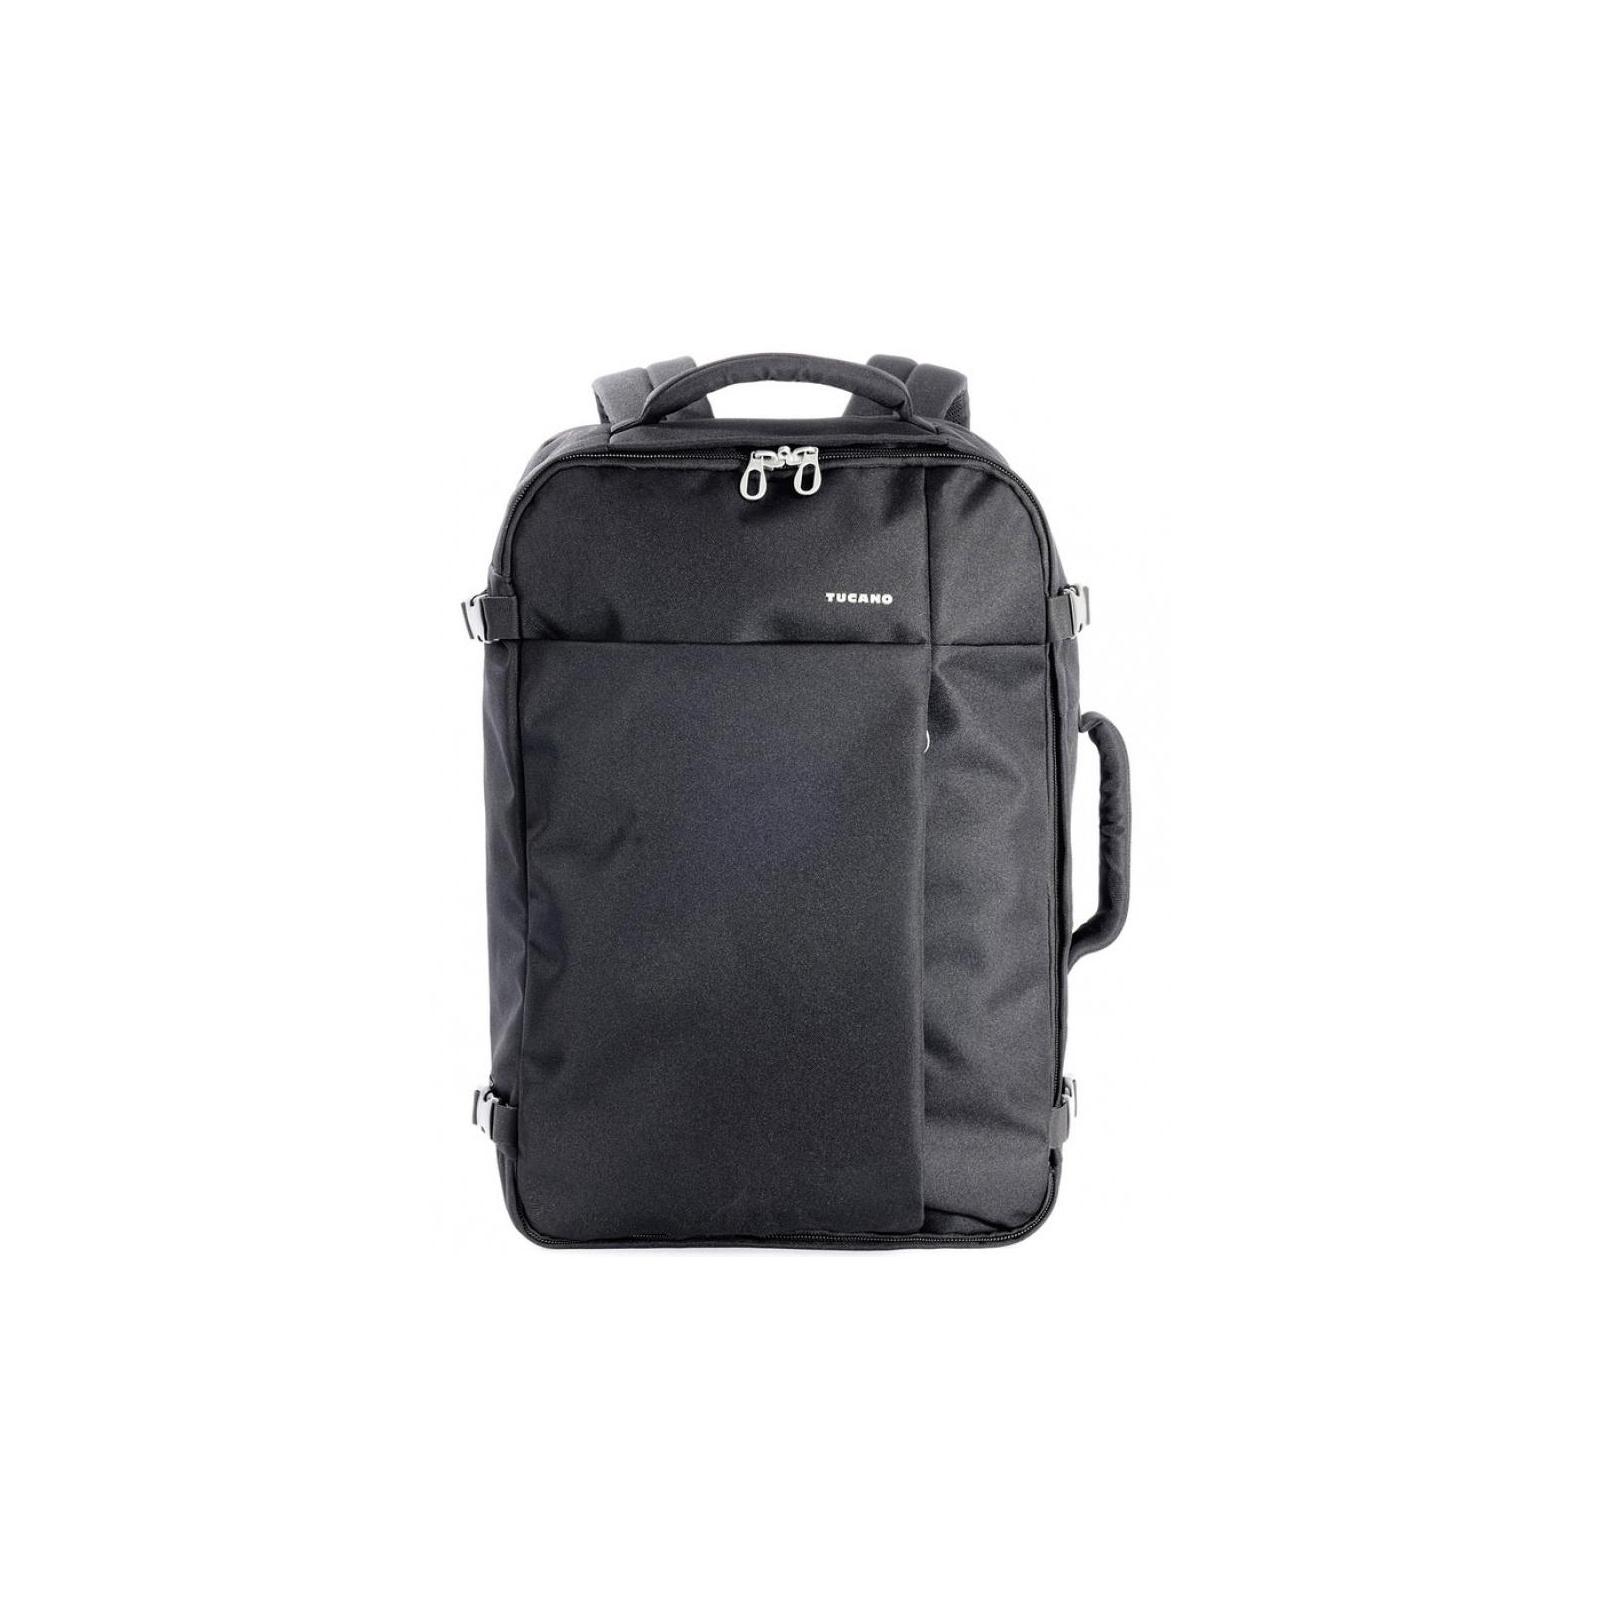 "Рюкзак для ноутбука Tucano 17.3"" TUGO' L CABIN black (BKTUG-L-BK) изображение 2"